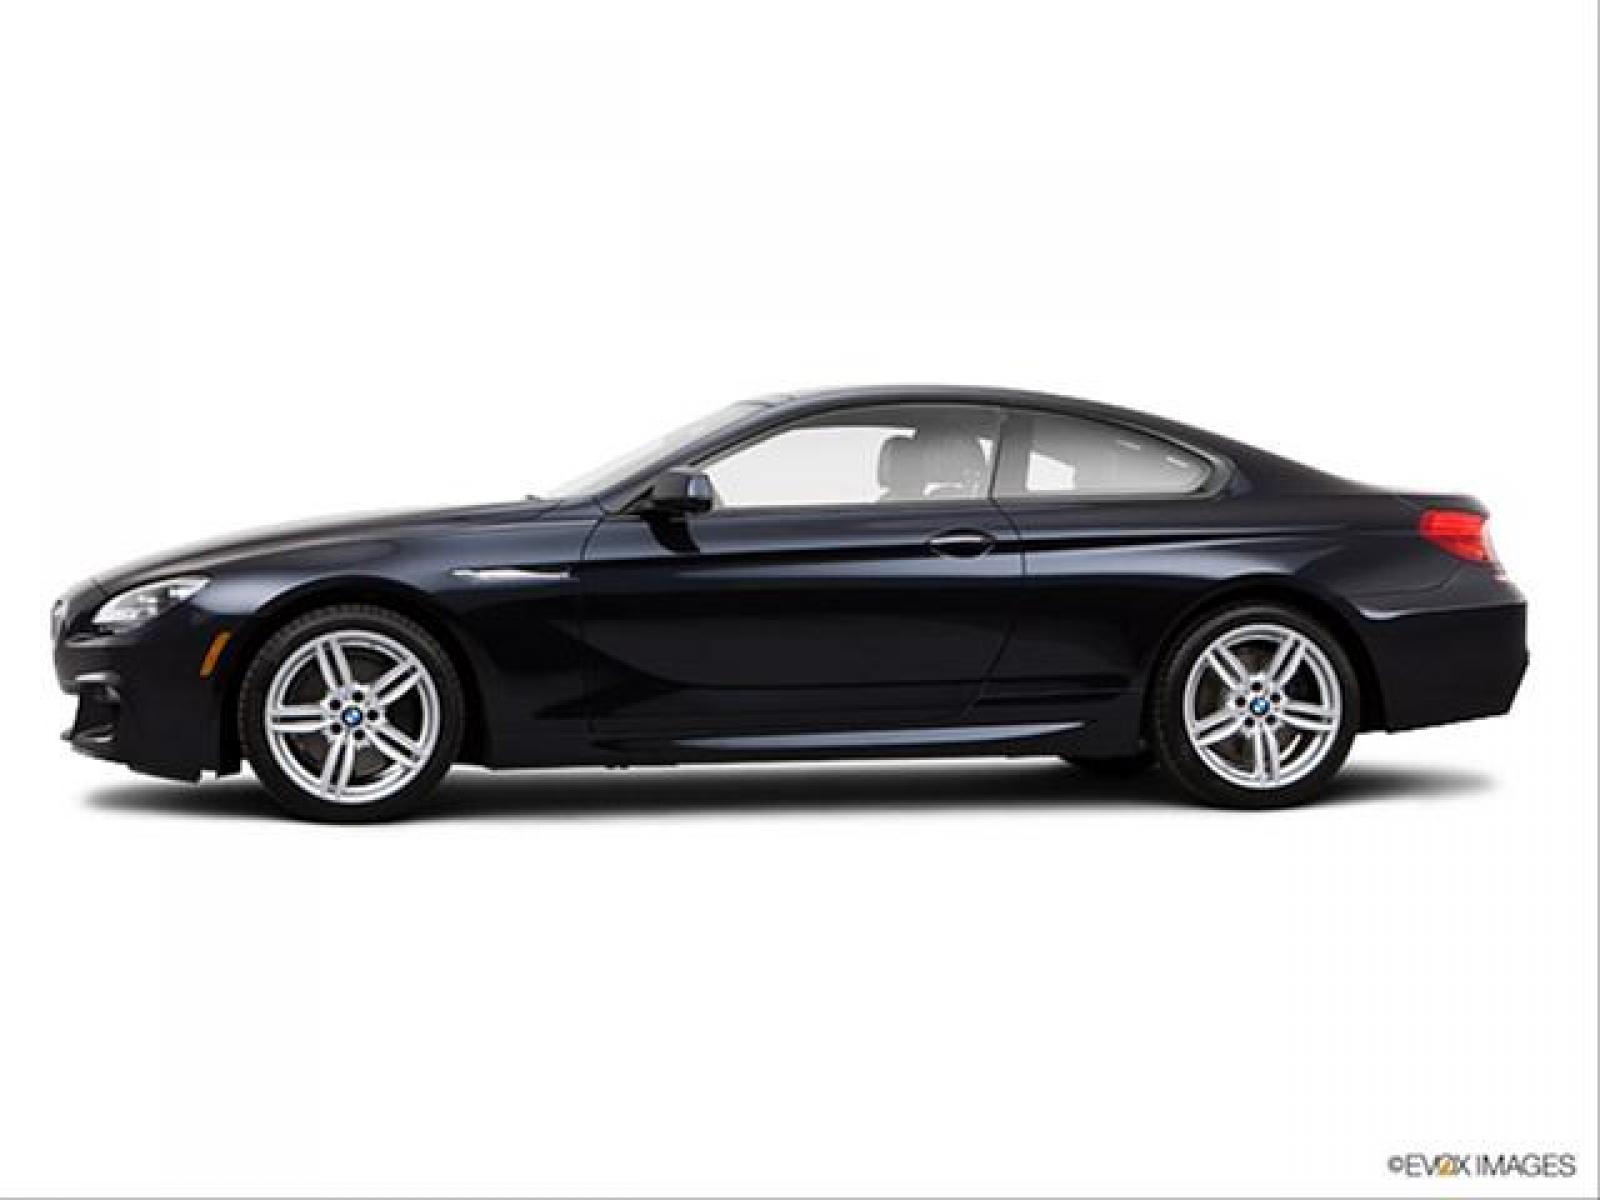 800 1024 1280 1600 Origin 2014 BMW 6 Series